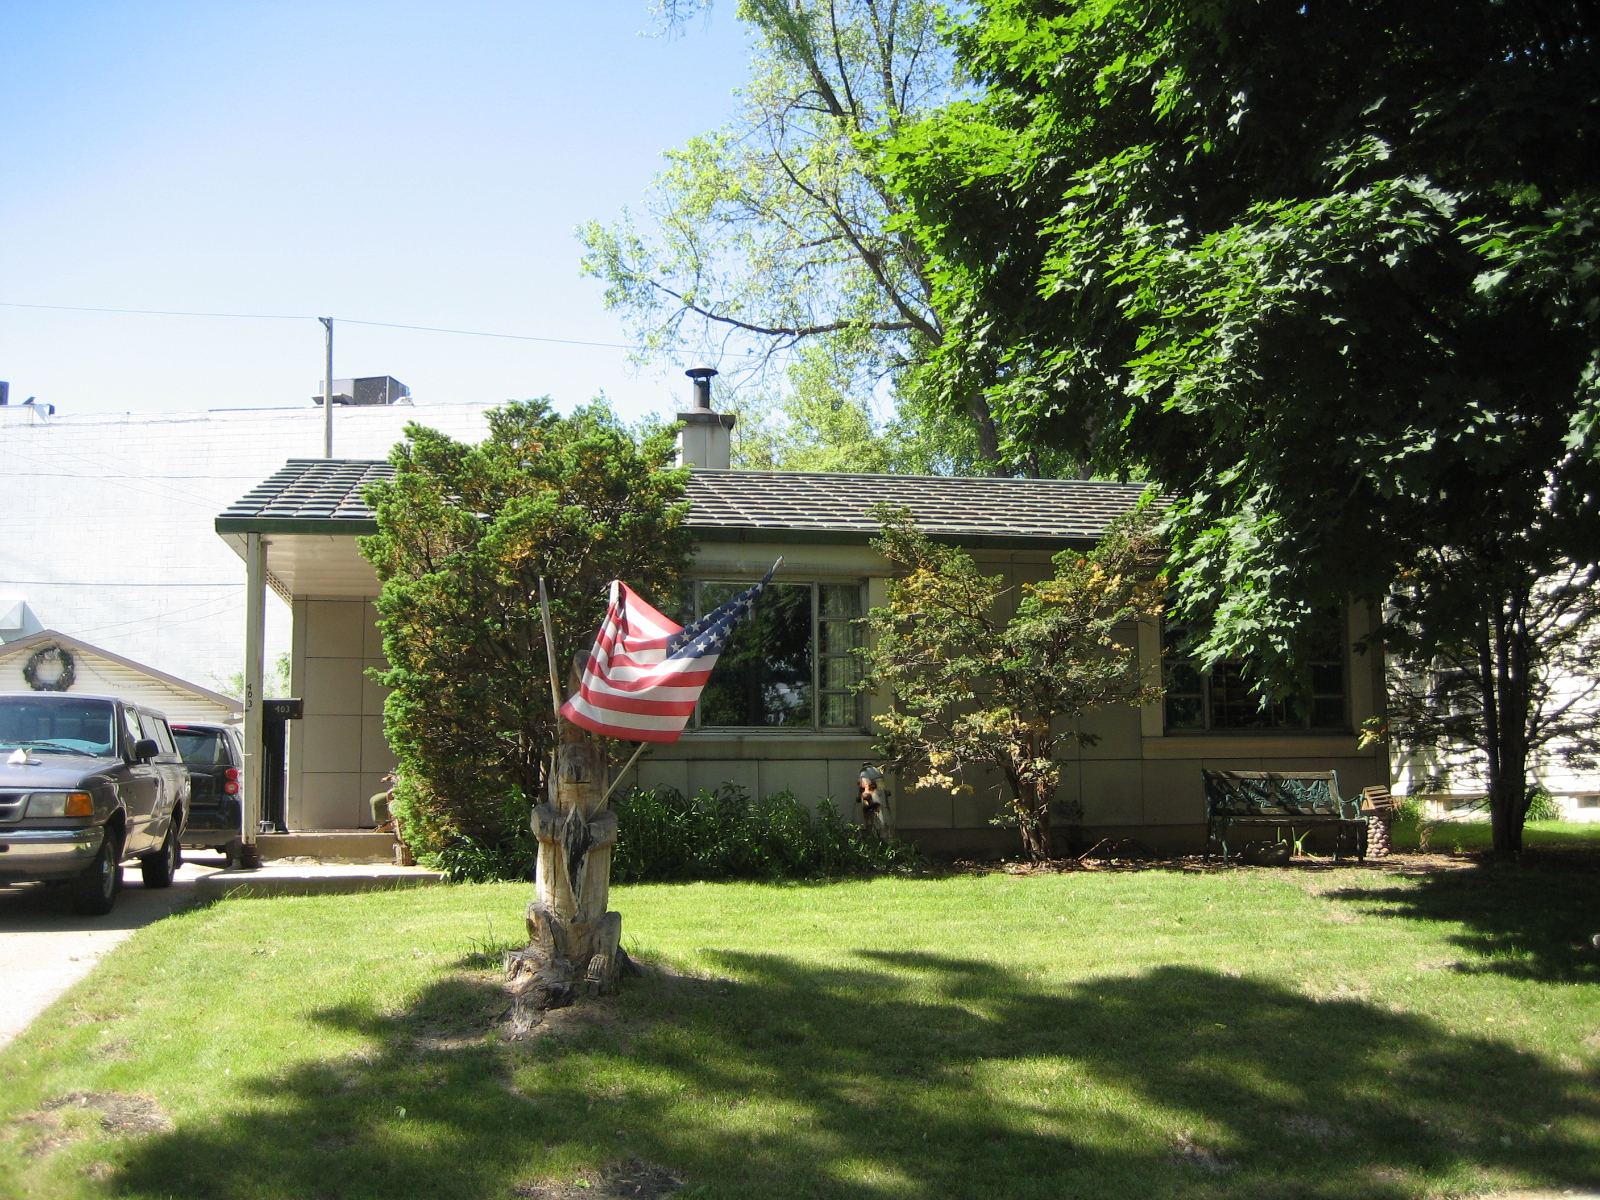 403 N. 91st St.